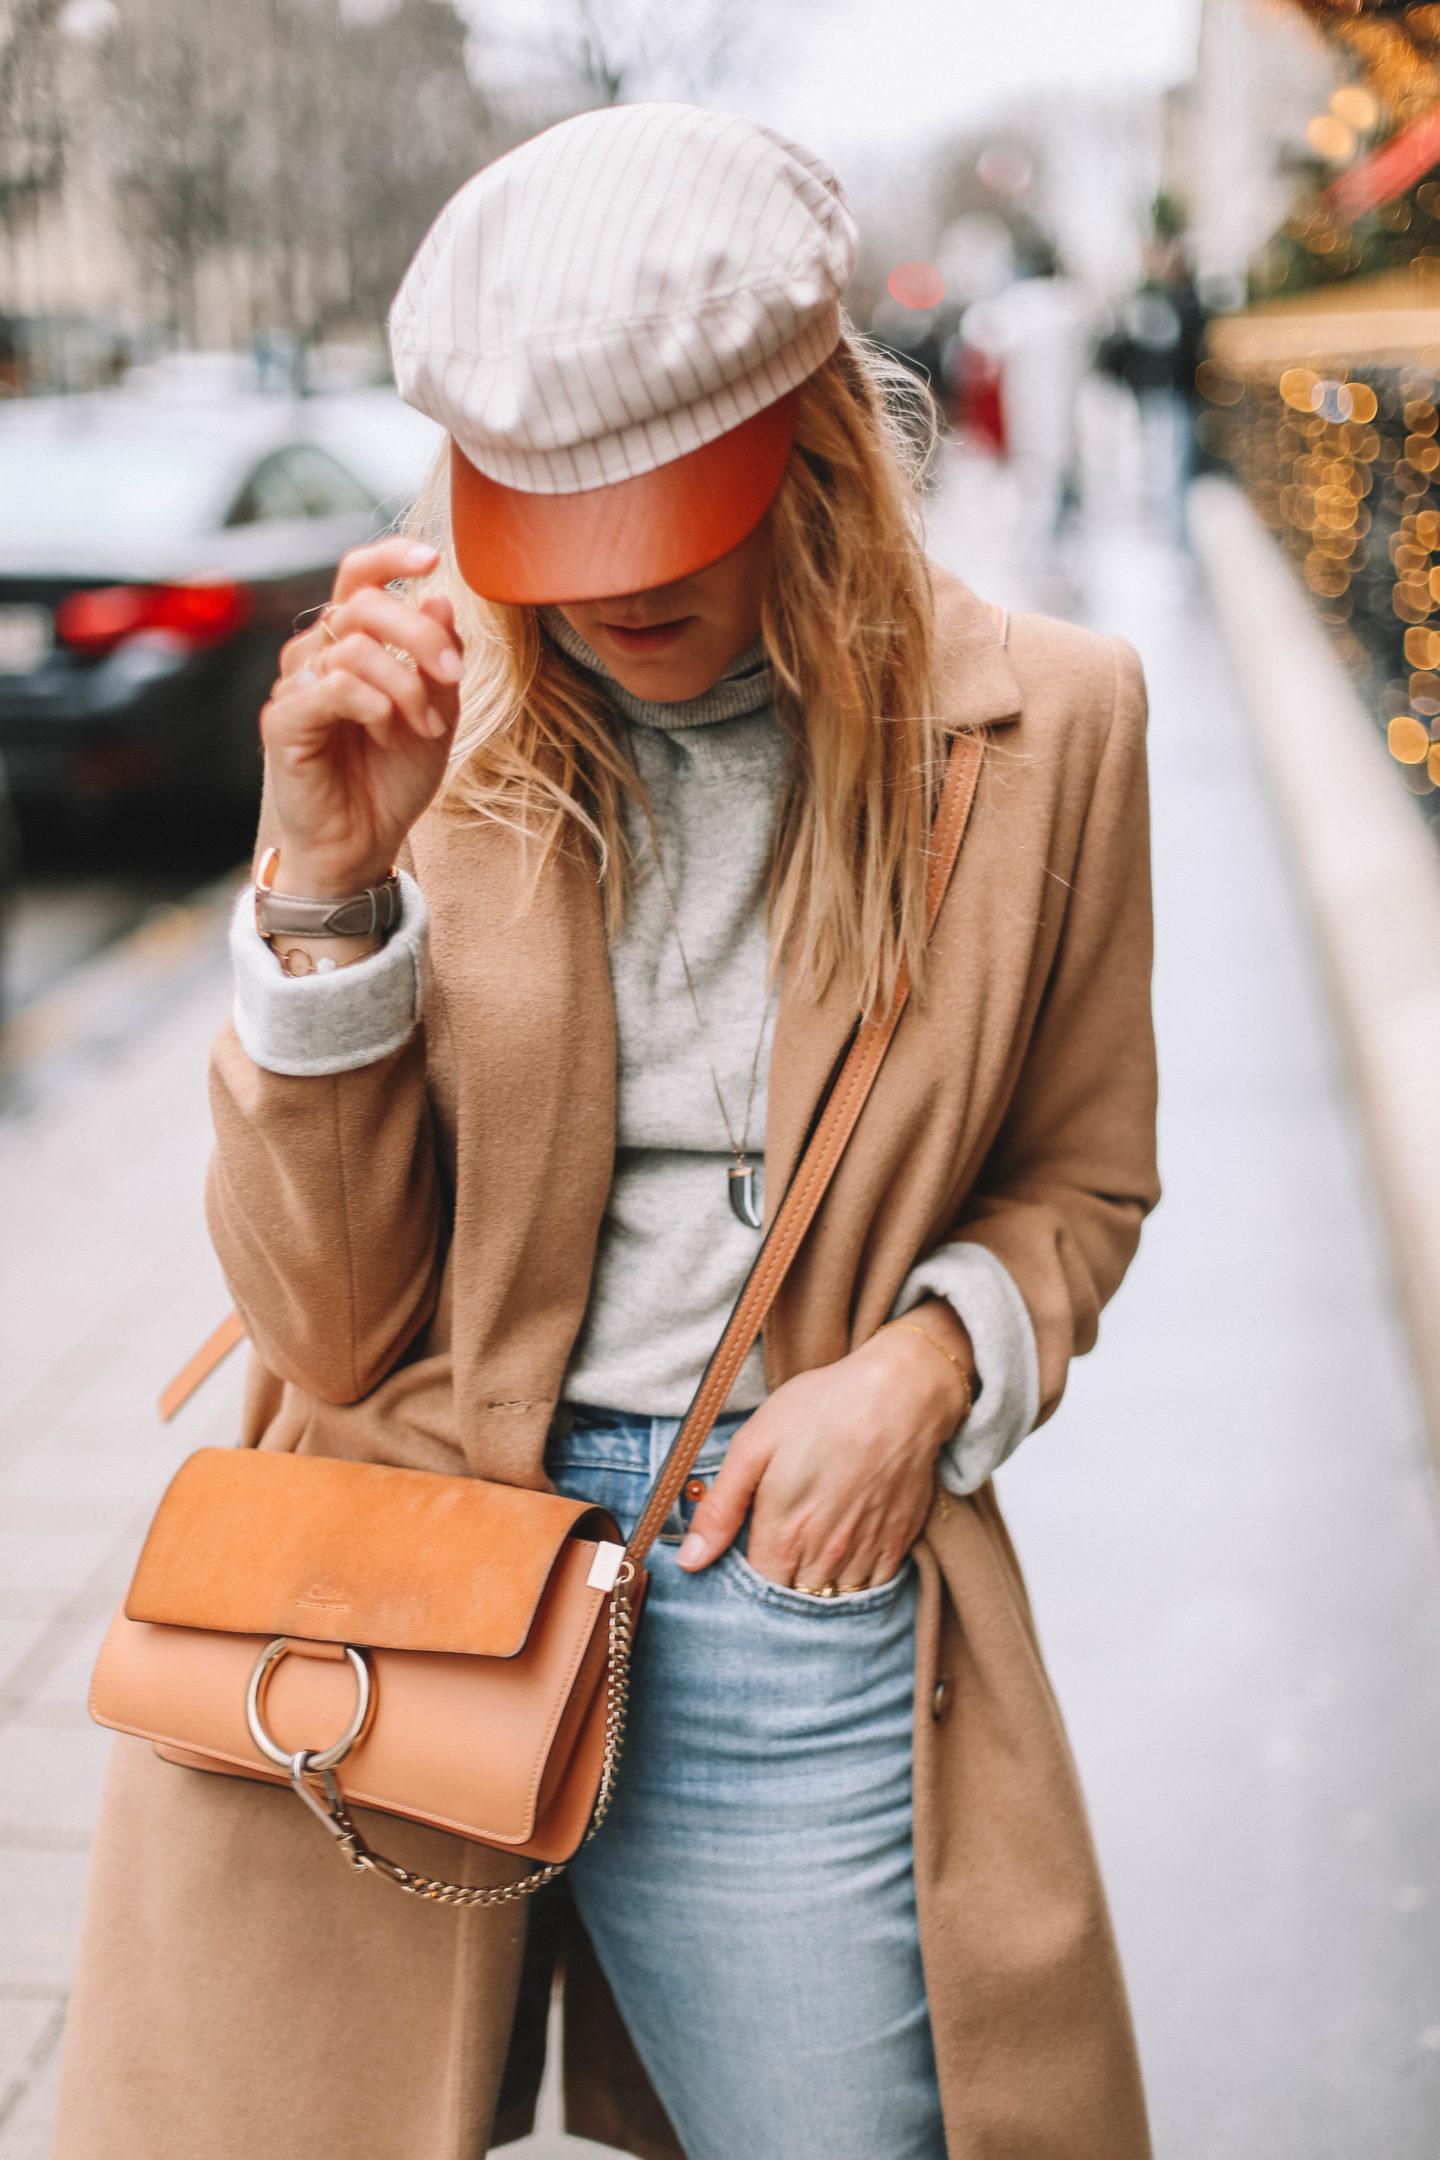 Sac Camel Chloé - Blondie Baby blog mode et voyages